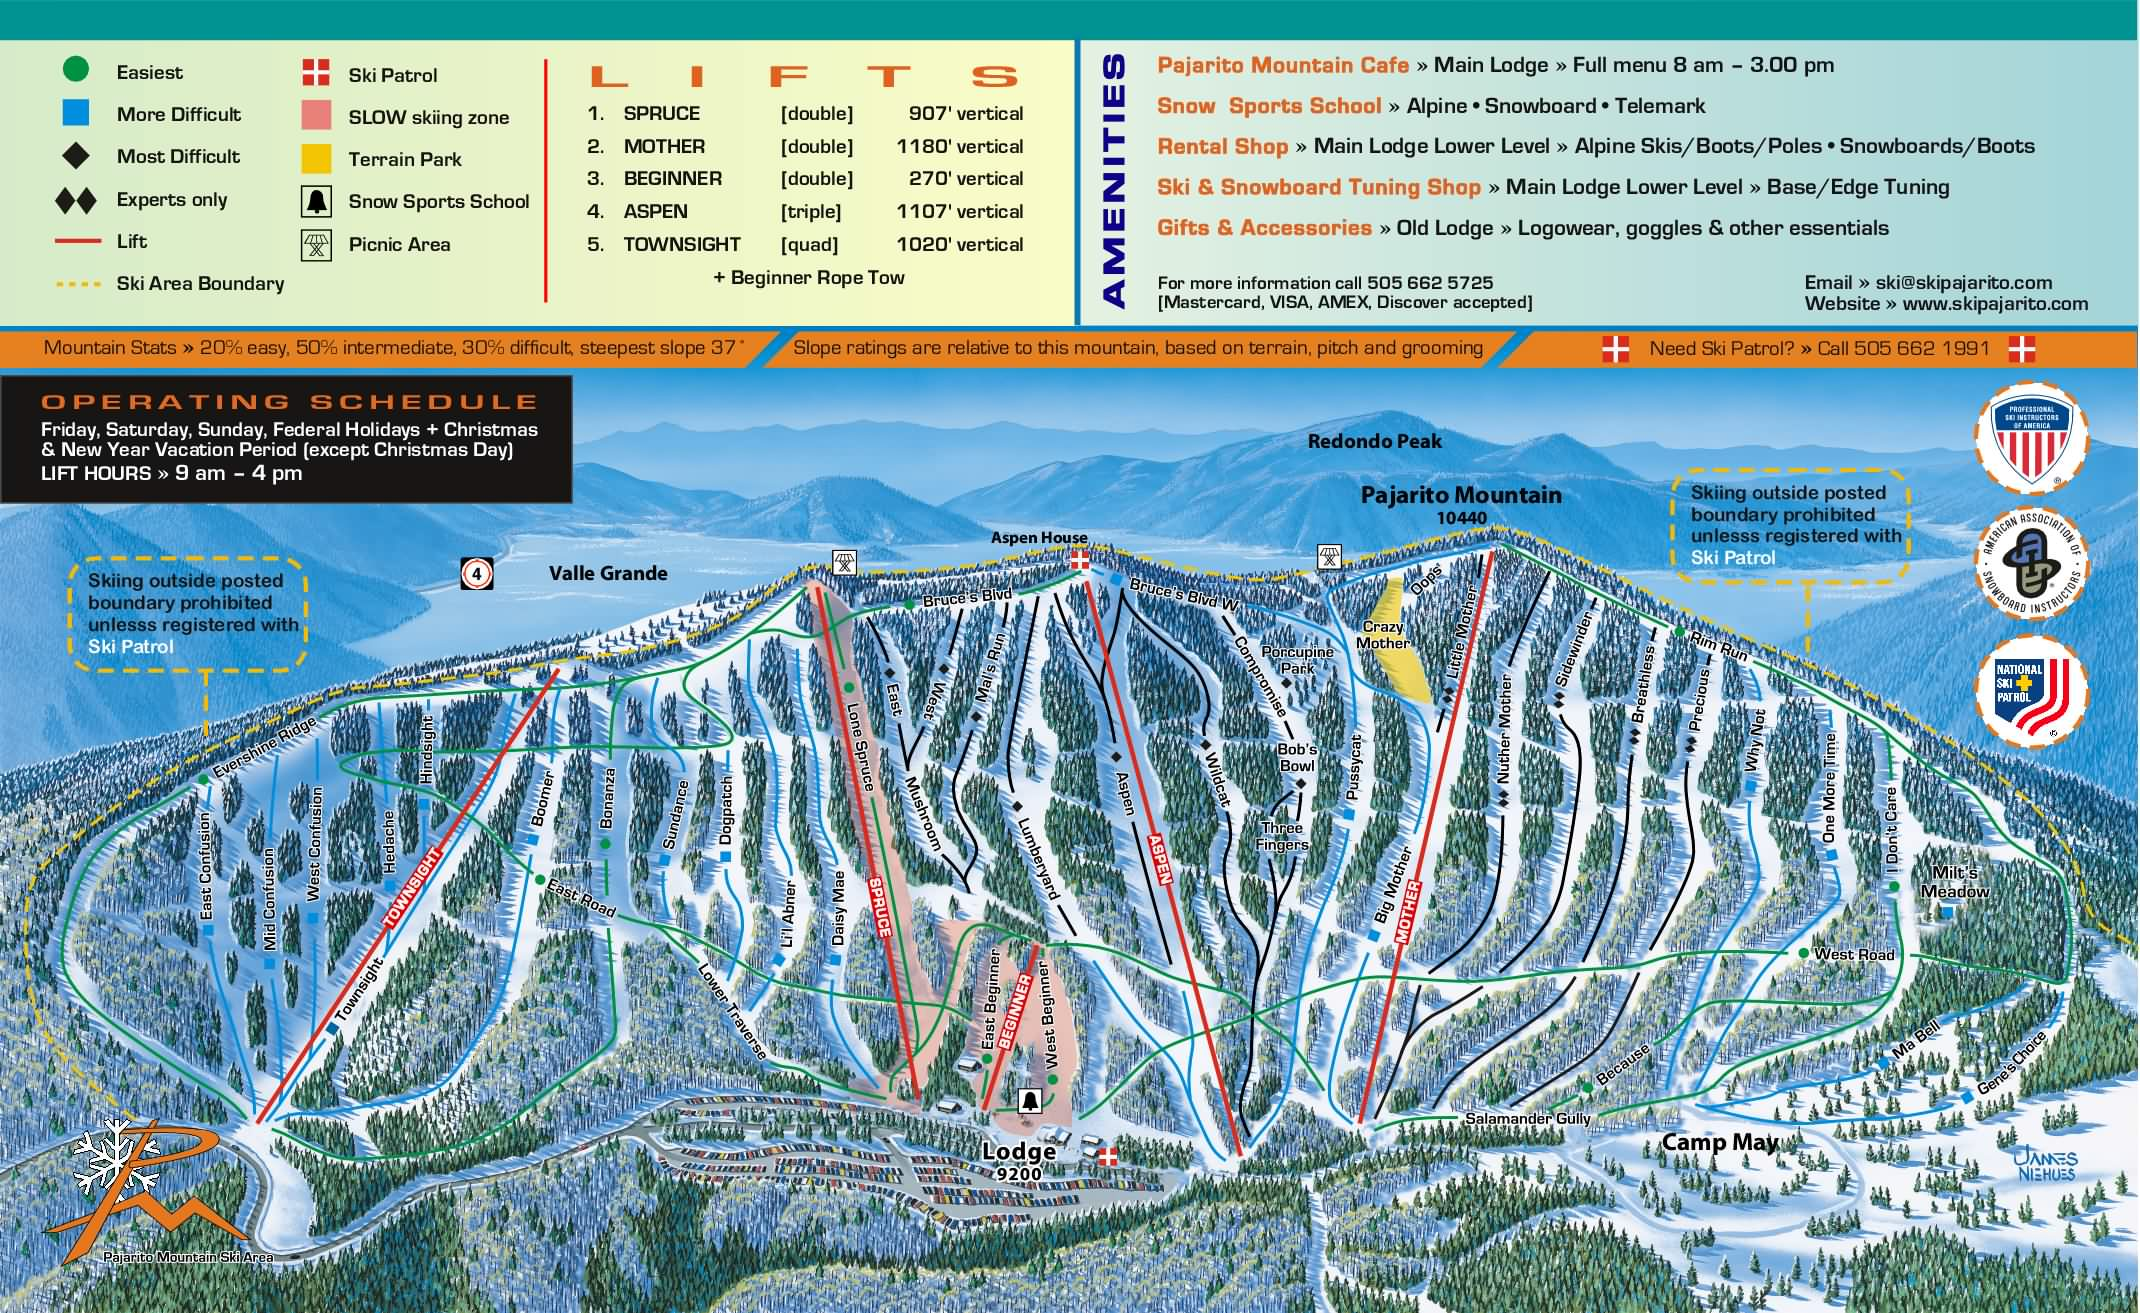 Pajarito Mountain Ski Trail Map Los Alamos New Mexico